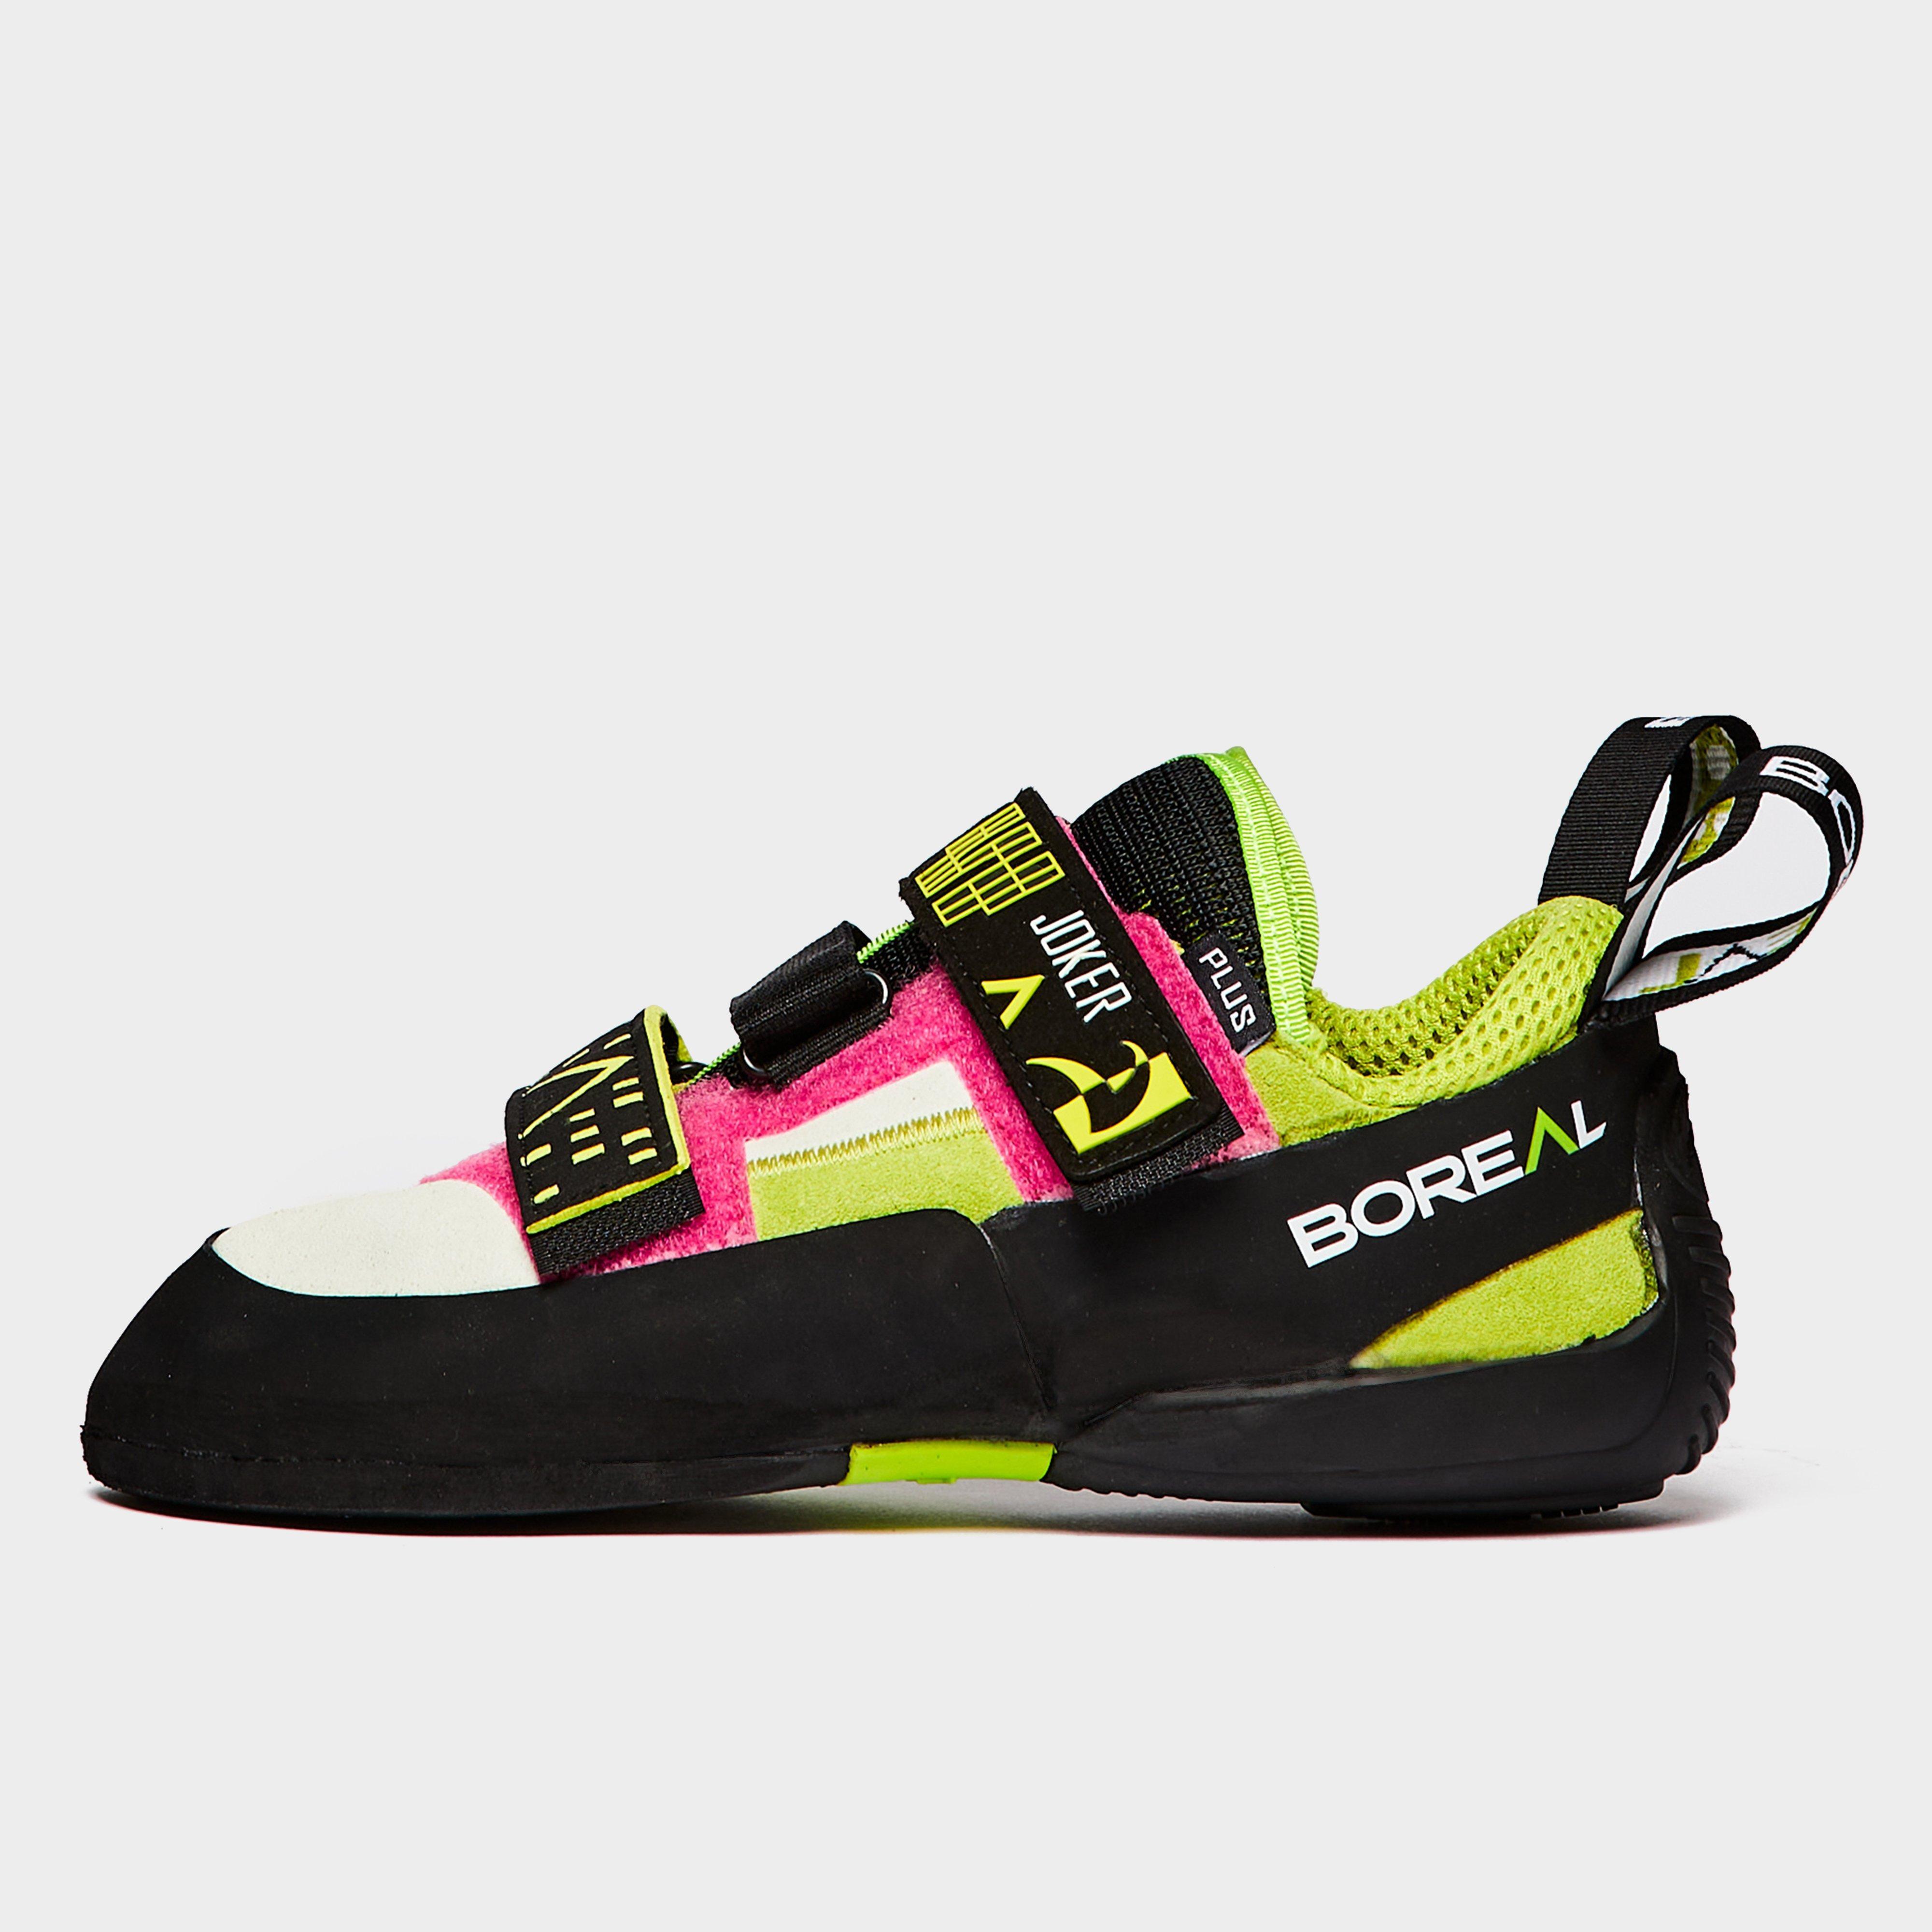 Boreal Womens Joker Plus Climbing Shoes - Multi/womens  Multi/womens